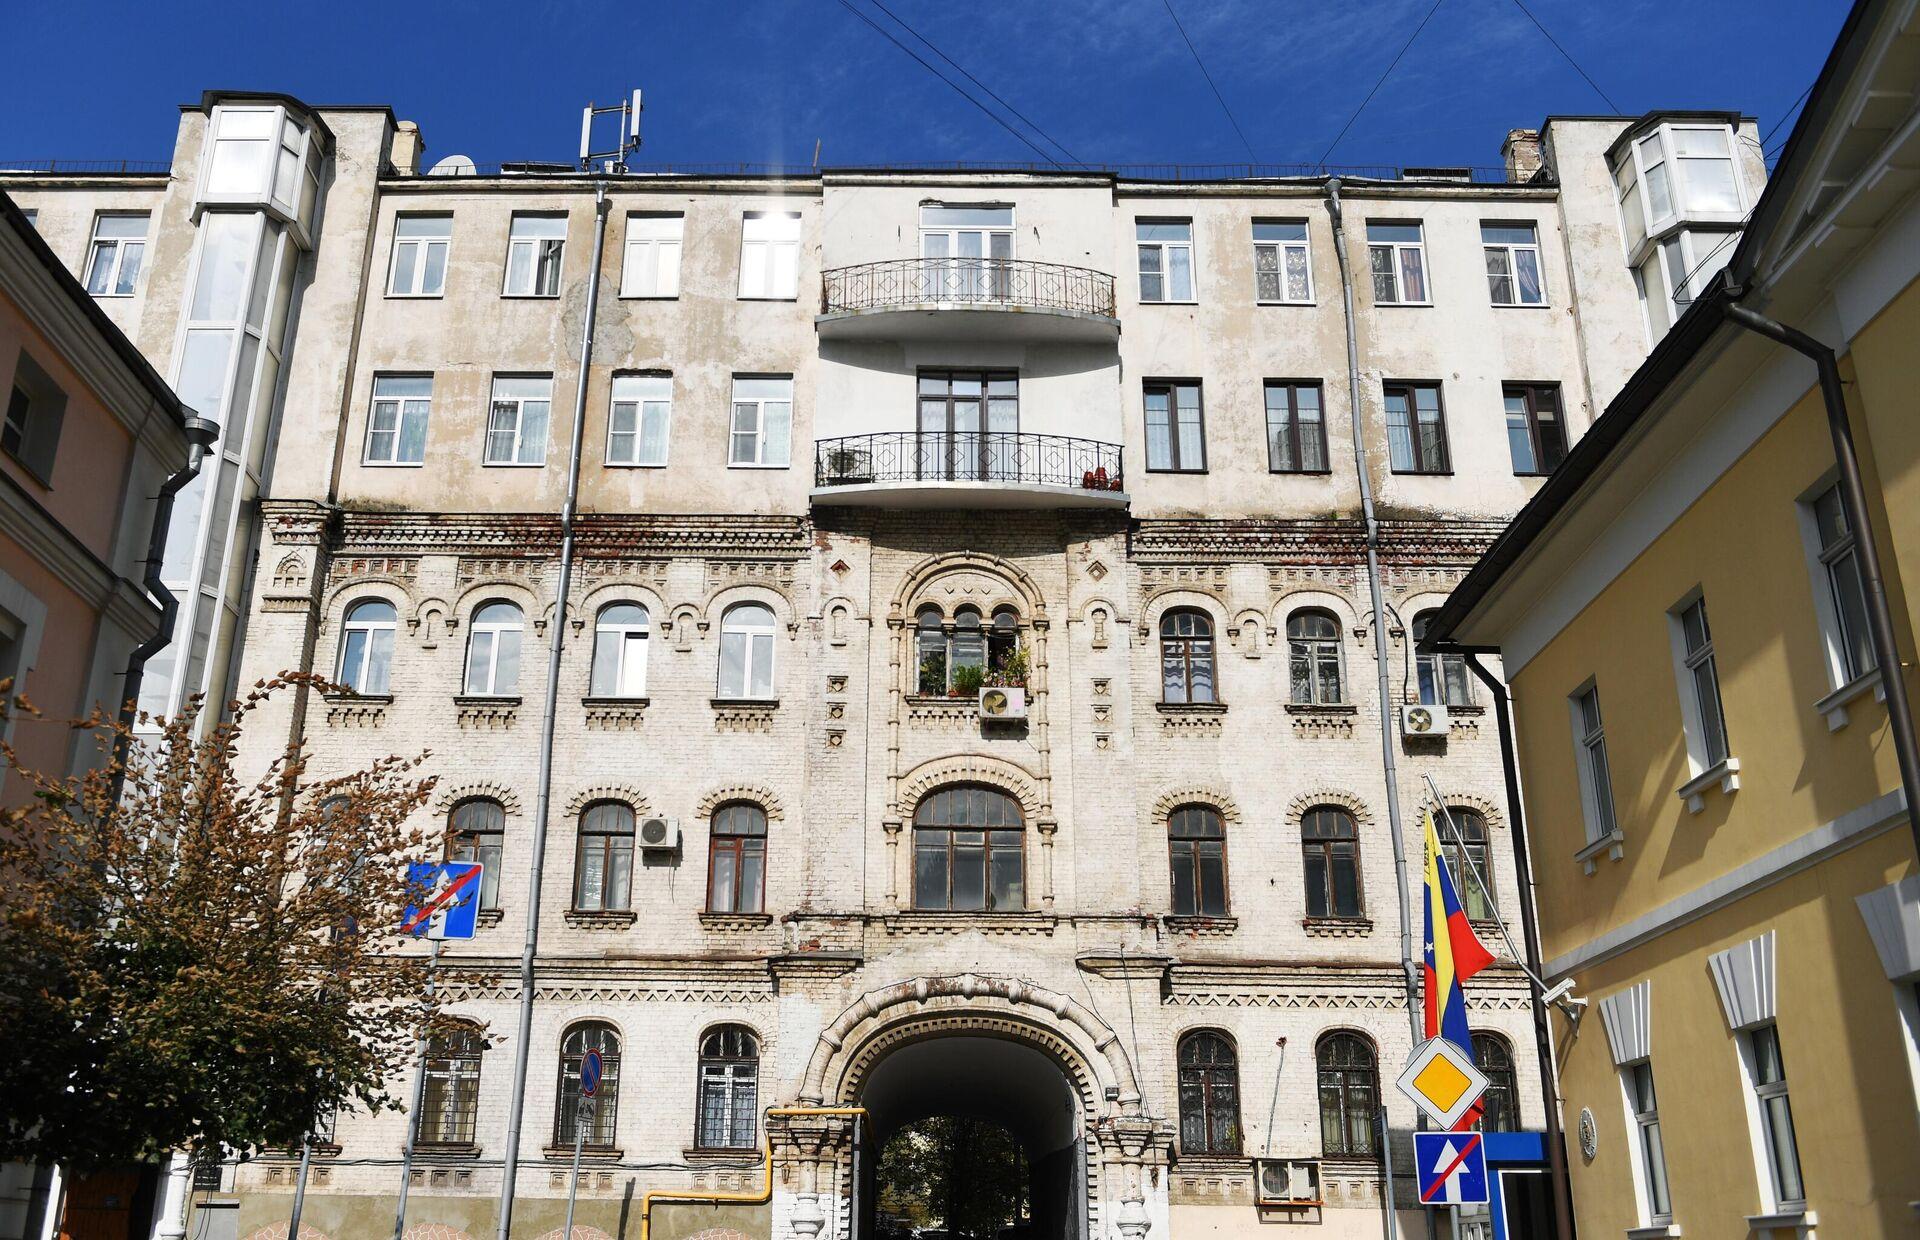 Фасад многоквартирного дома во 2-м Троицком переулке, 6 в Москве - РИА Новости, 1920, 14.07.2021